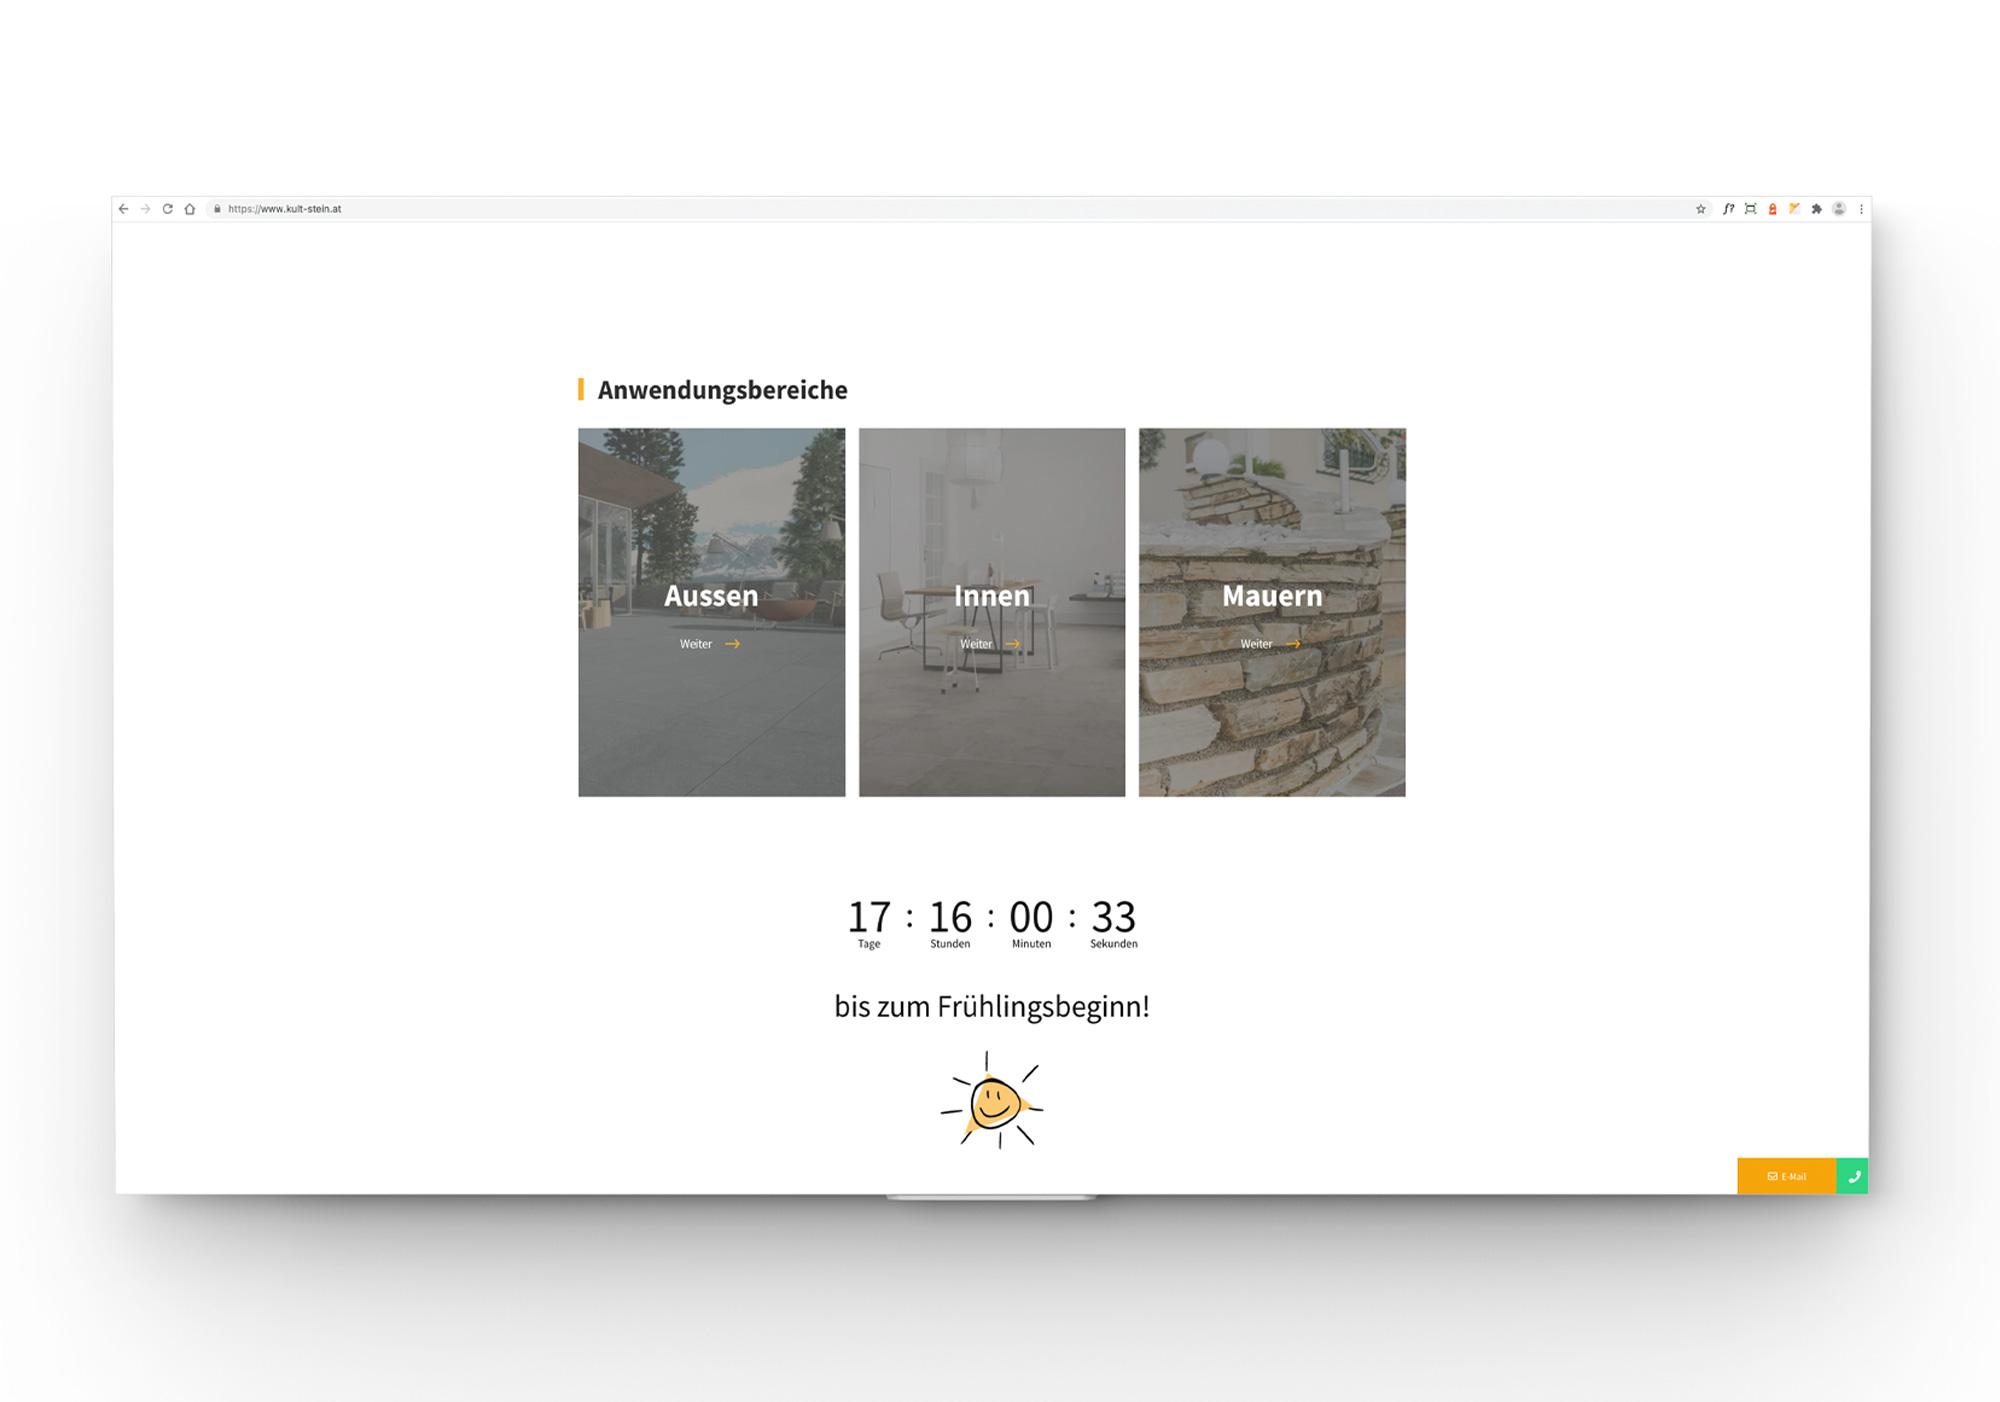 kultstein_webseite_2_2